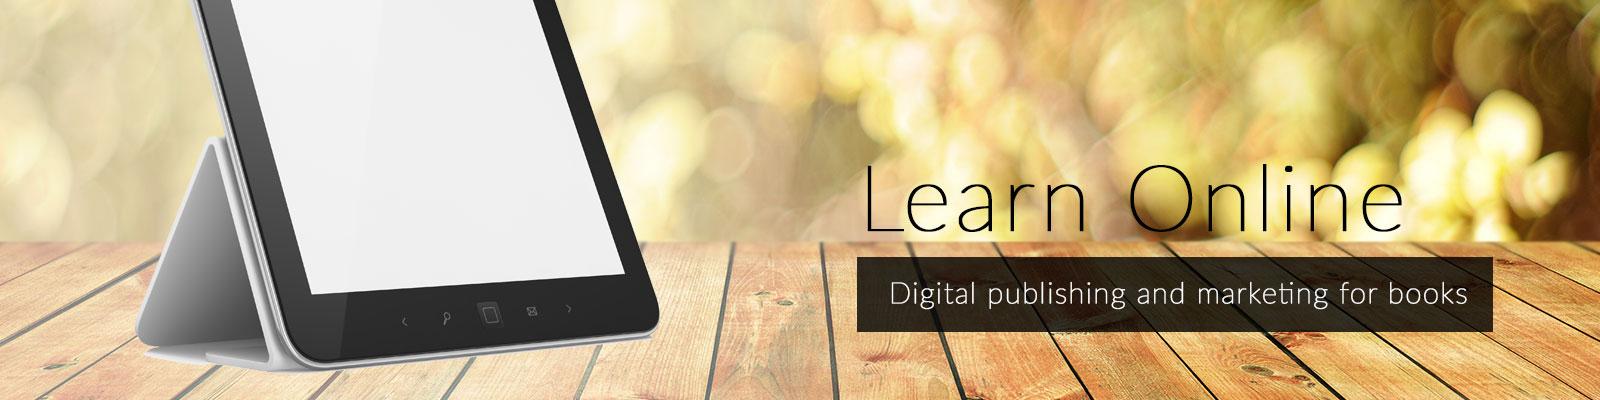 Learn online - Publishing & marketing for books